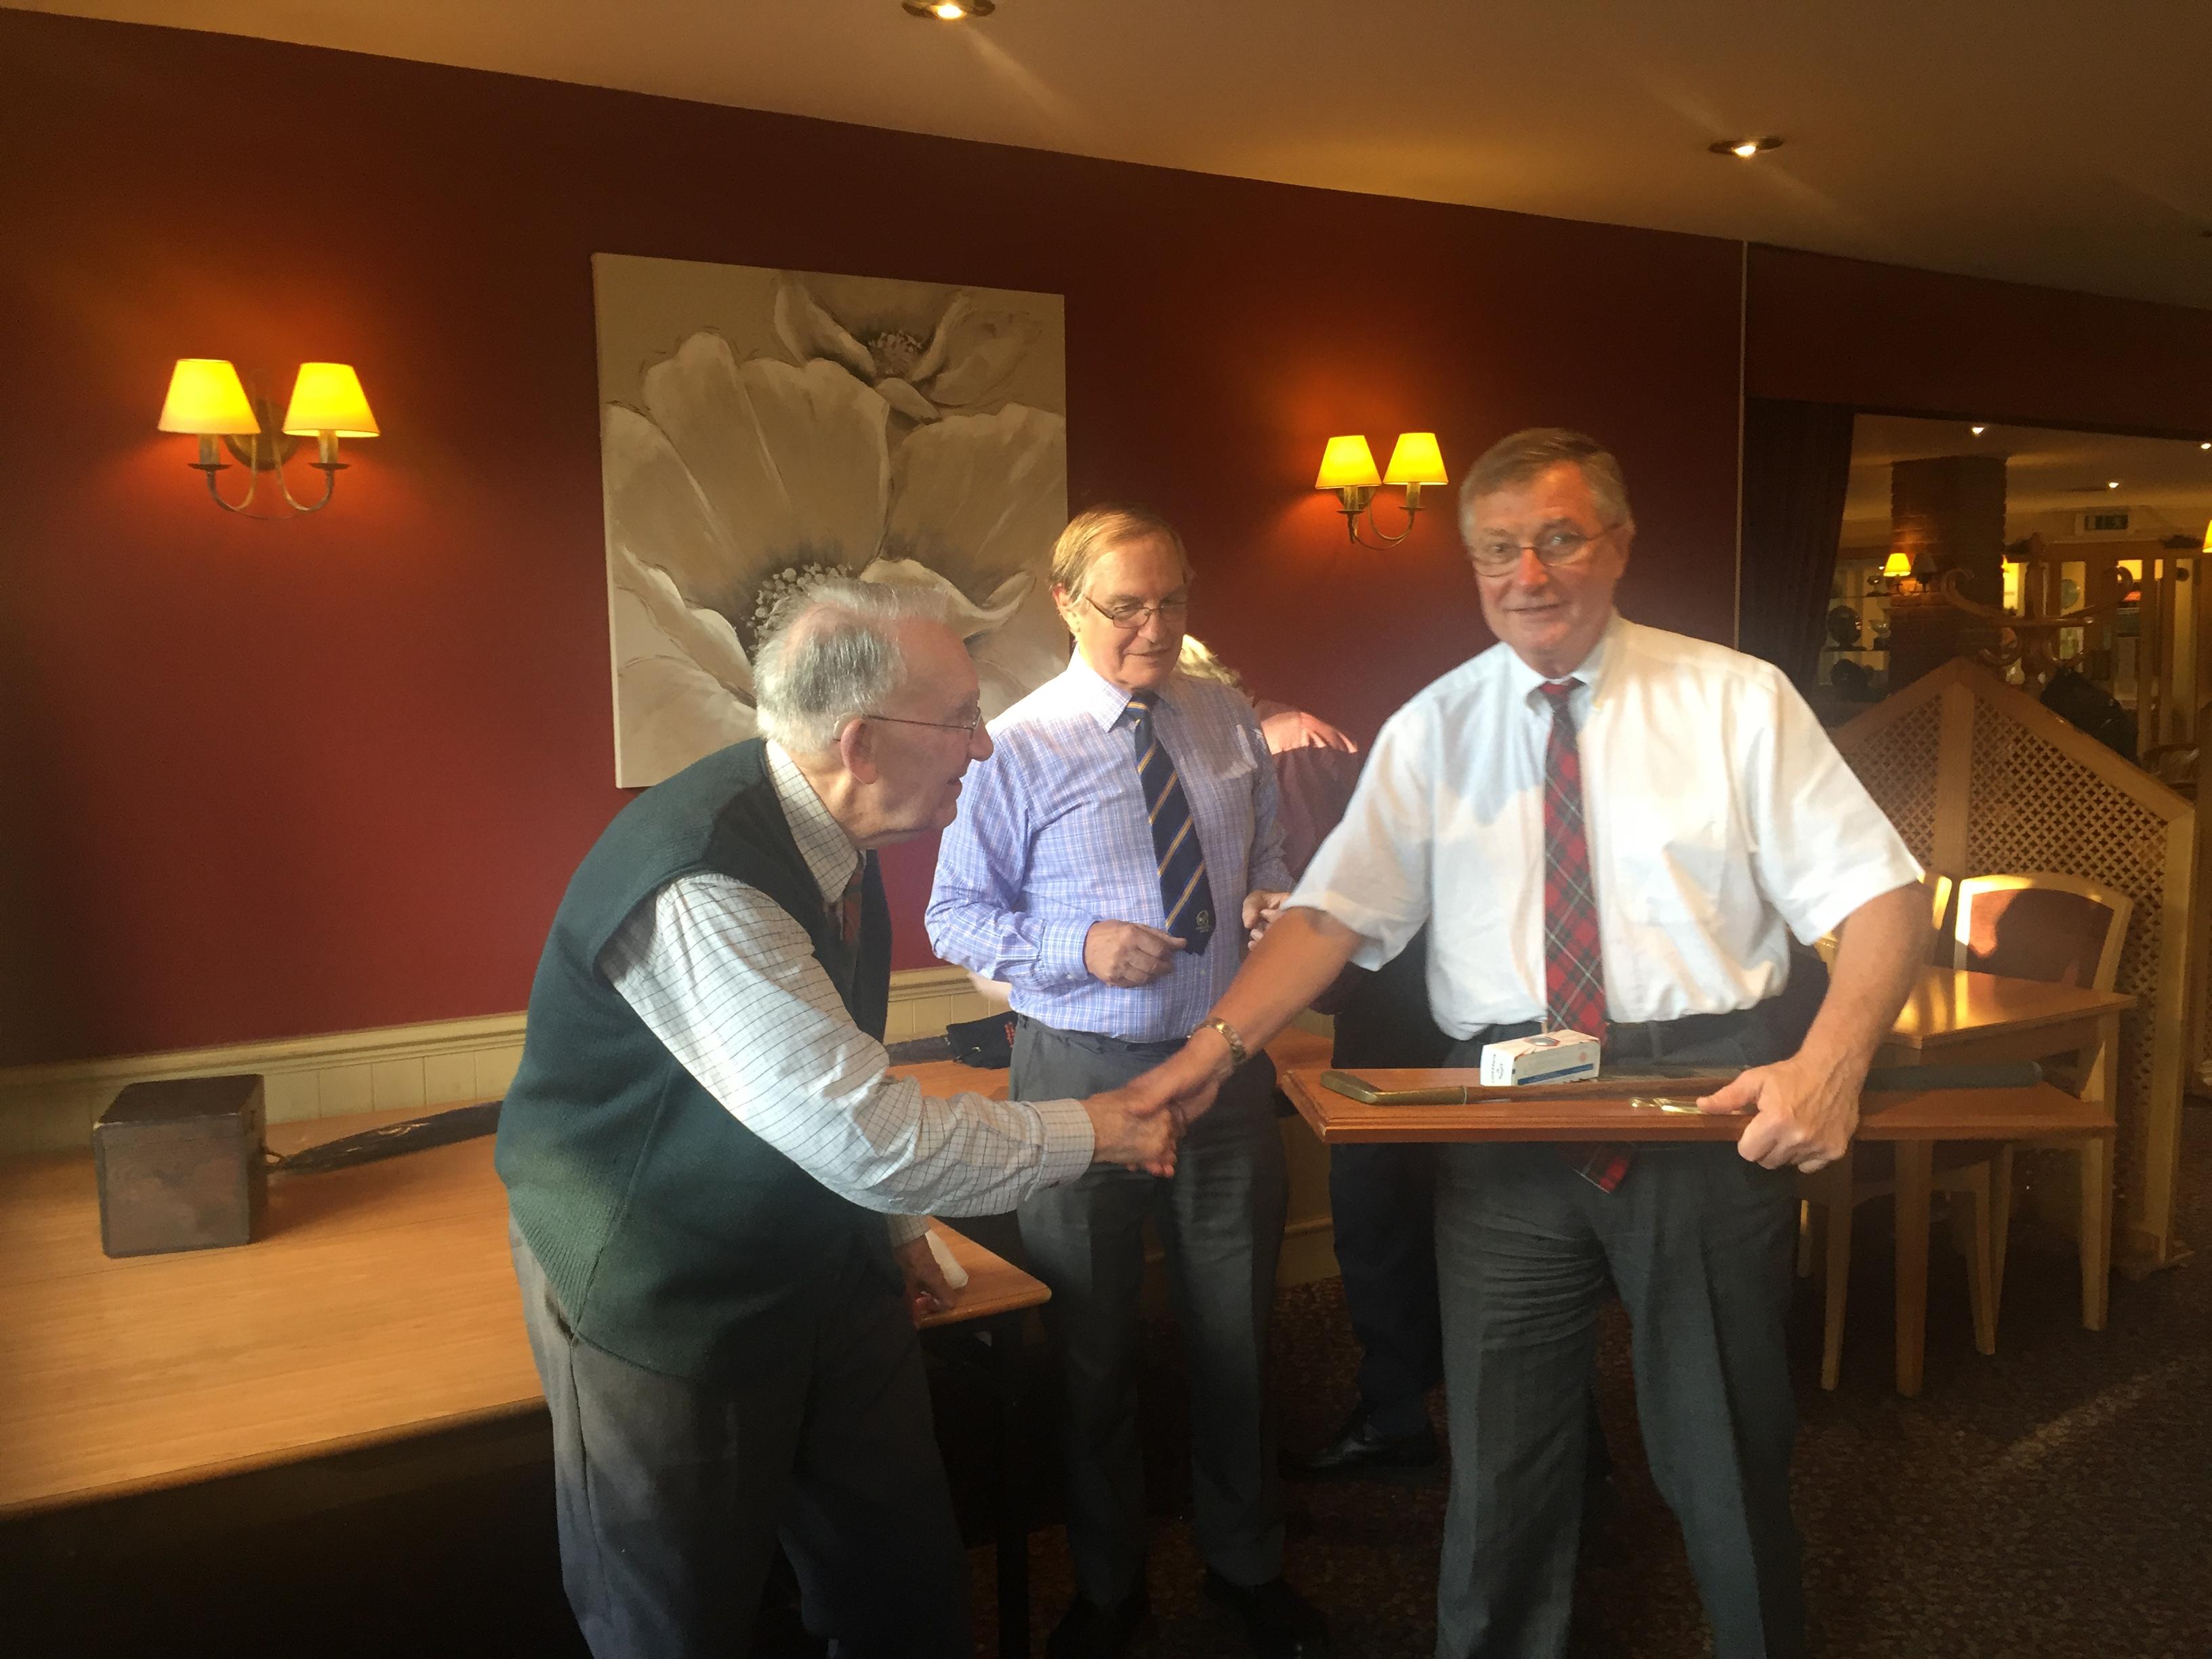 Rev. David Black receiving the Patrcik Figgis Putter at Bromsgrove Golf Club